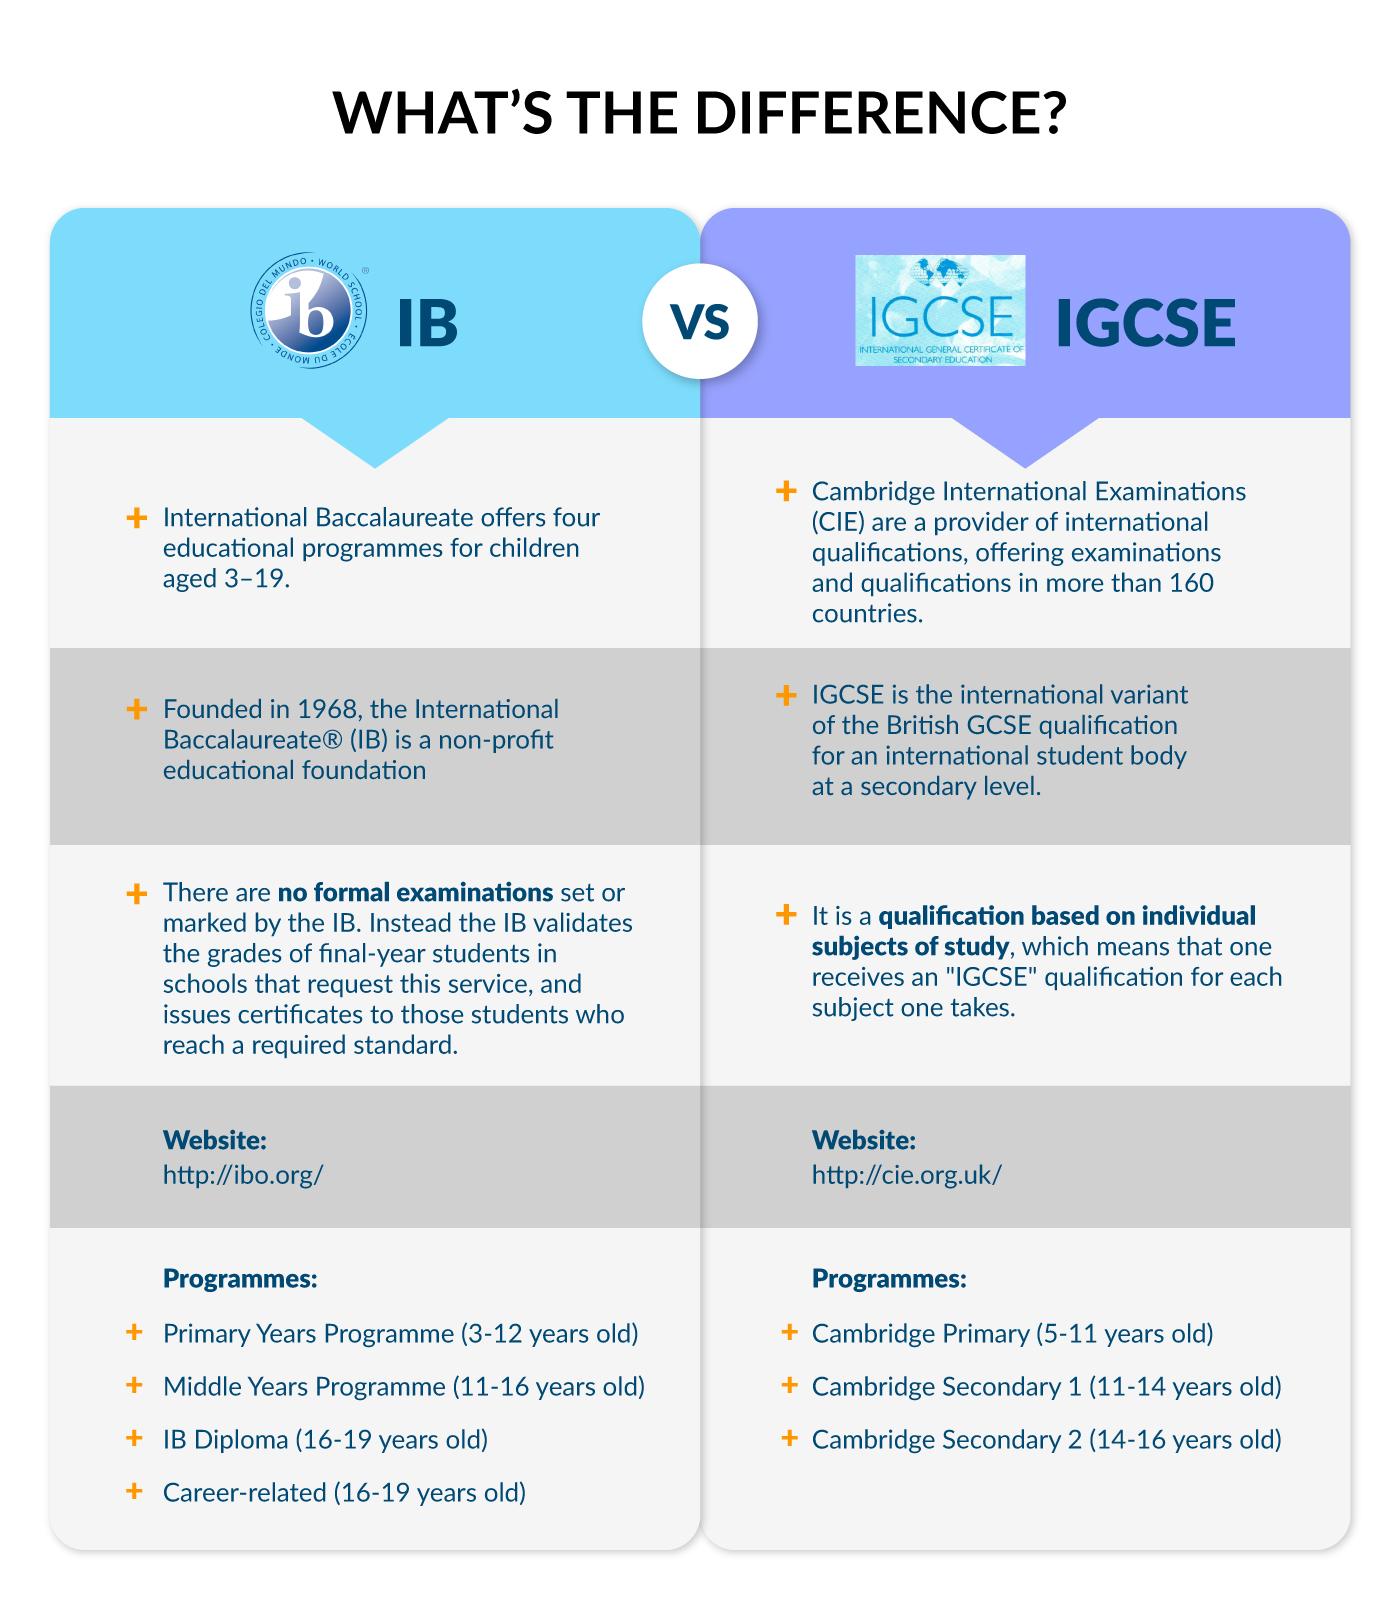 IB IGCSE Differences